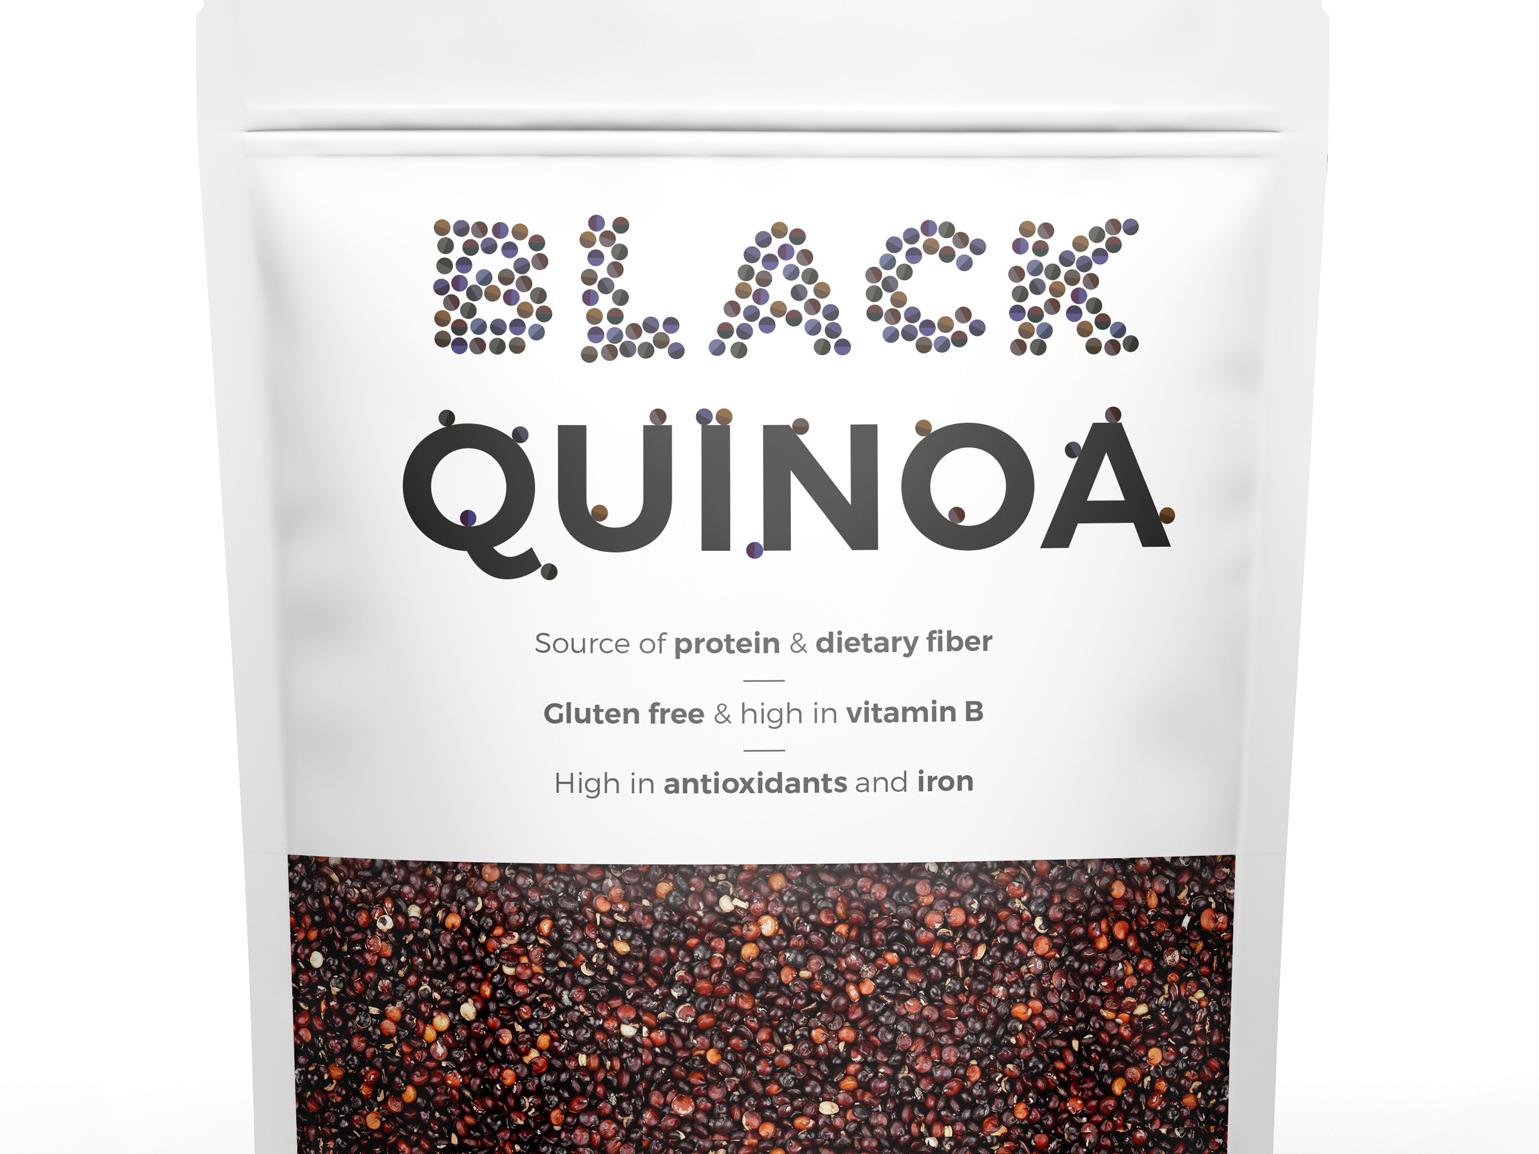 Black Quinoa health simple grains seeds packaging nuts black quinoa quinoa illustration illustrator